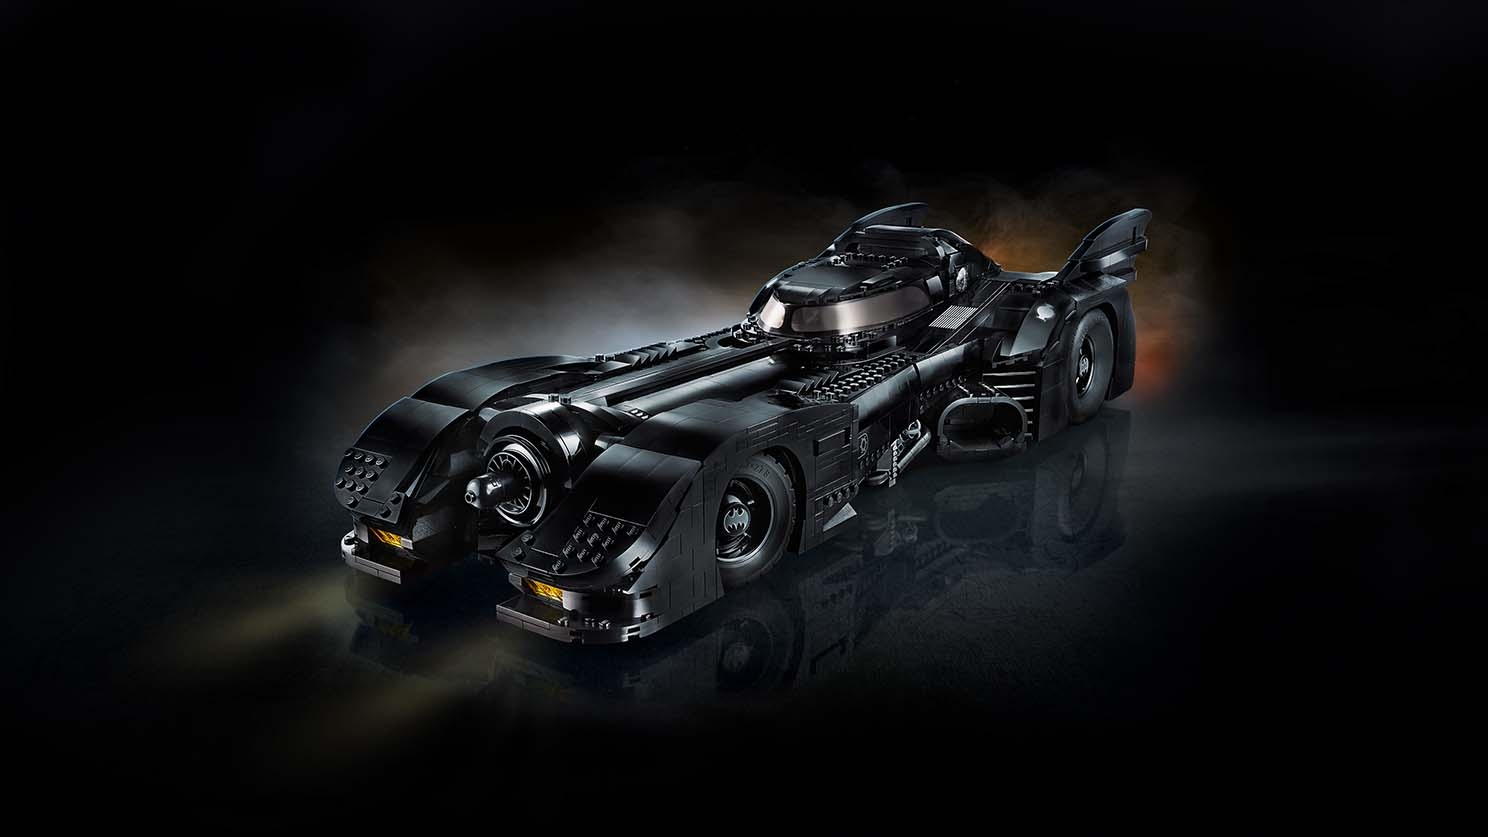 76139 - 1989 Batmobile™